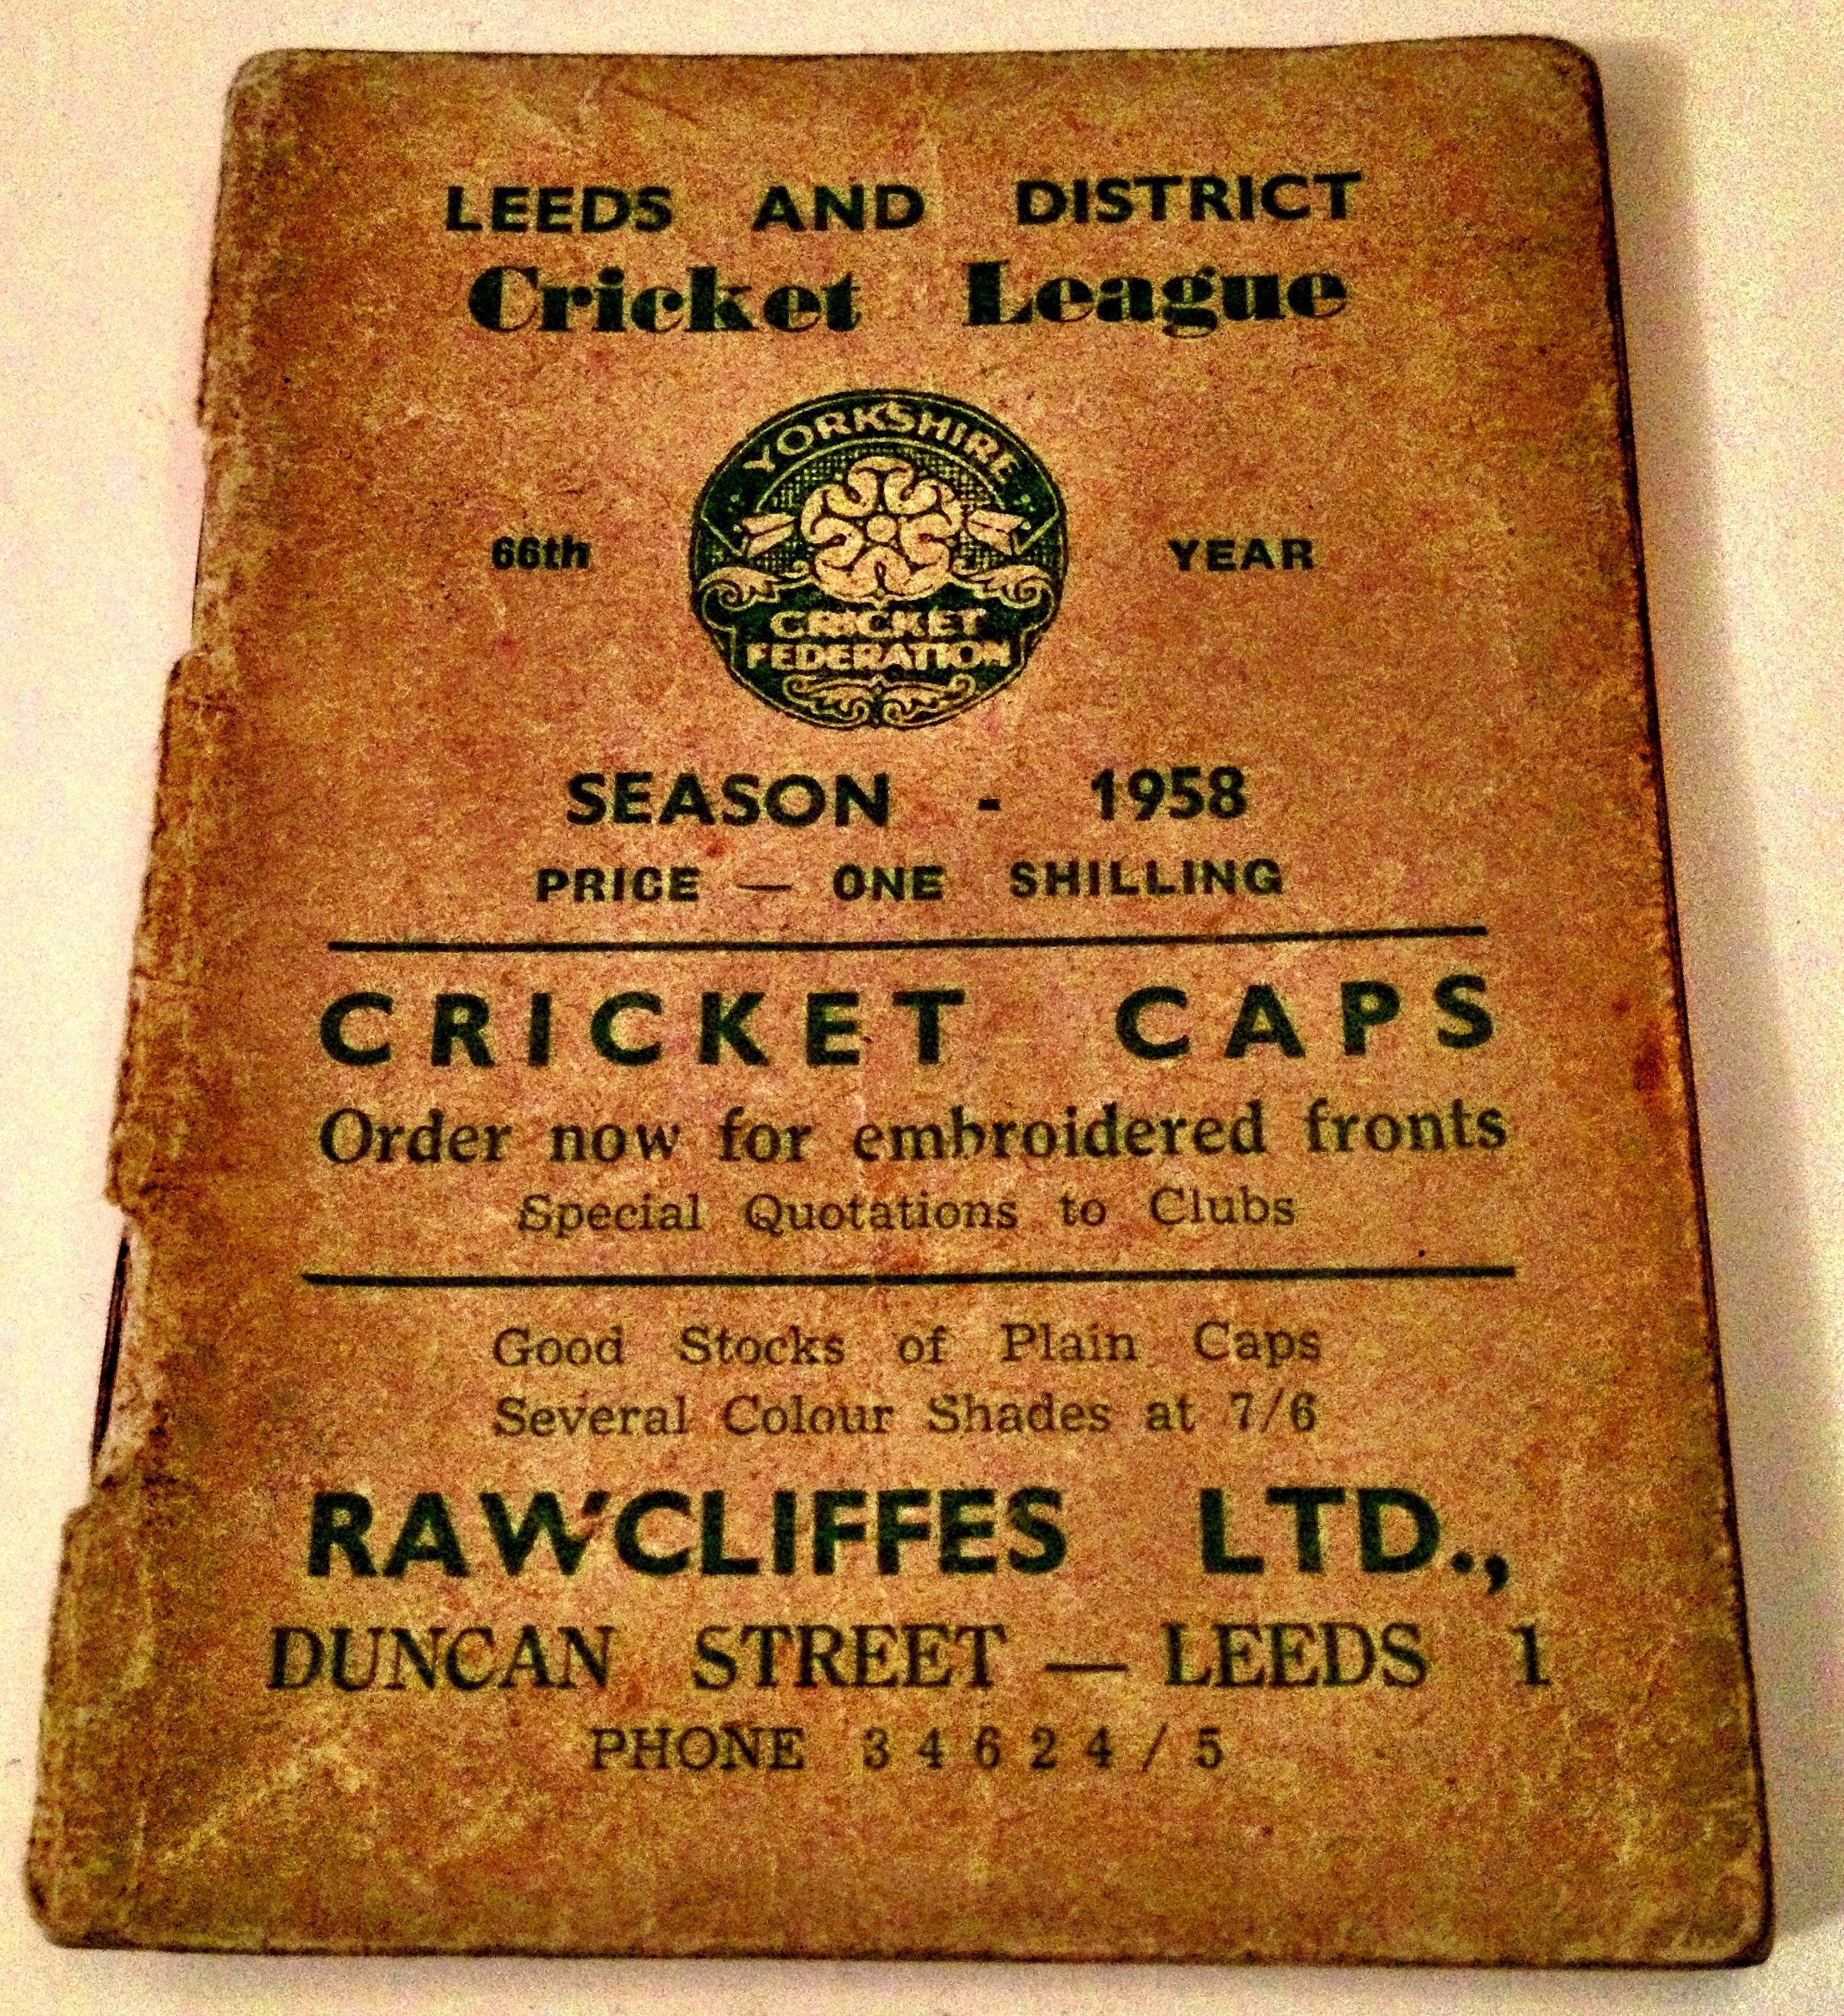 League Handbook 1958